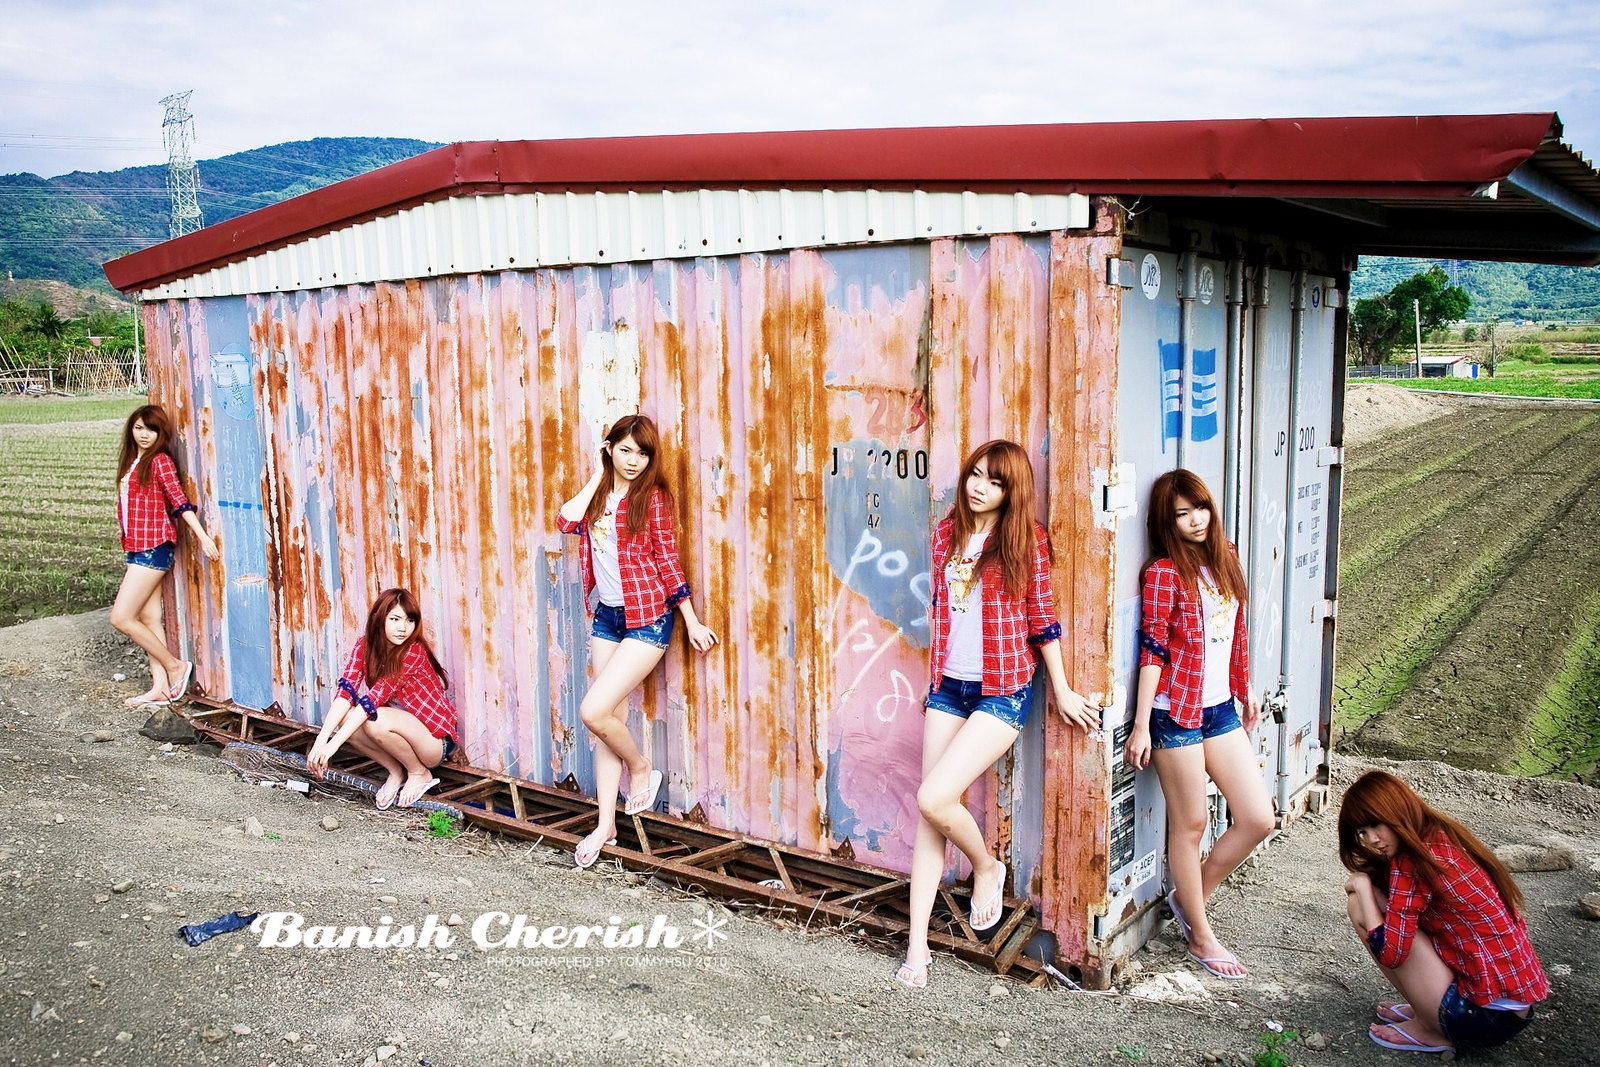 2010.12.18 放逐*Cherish